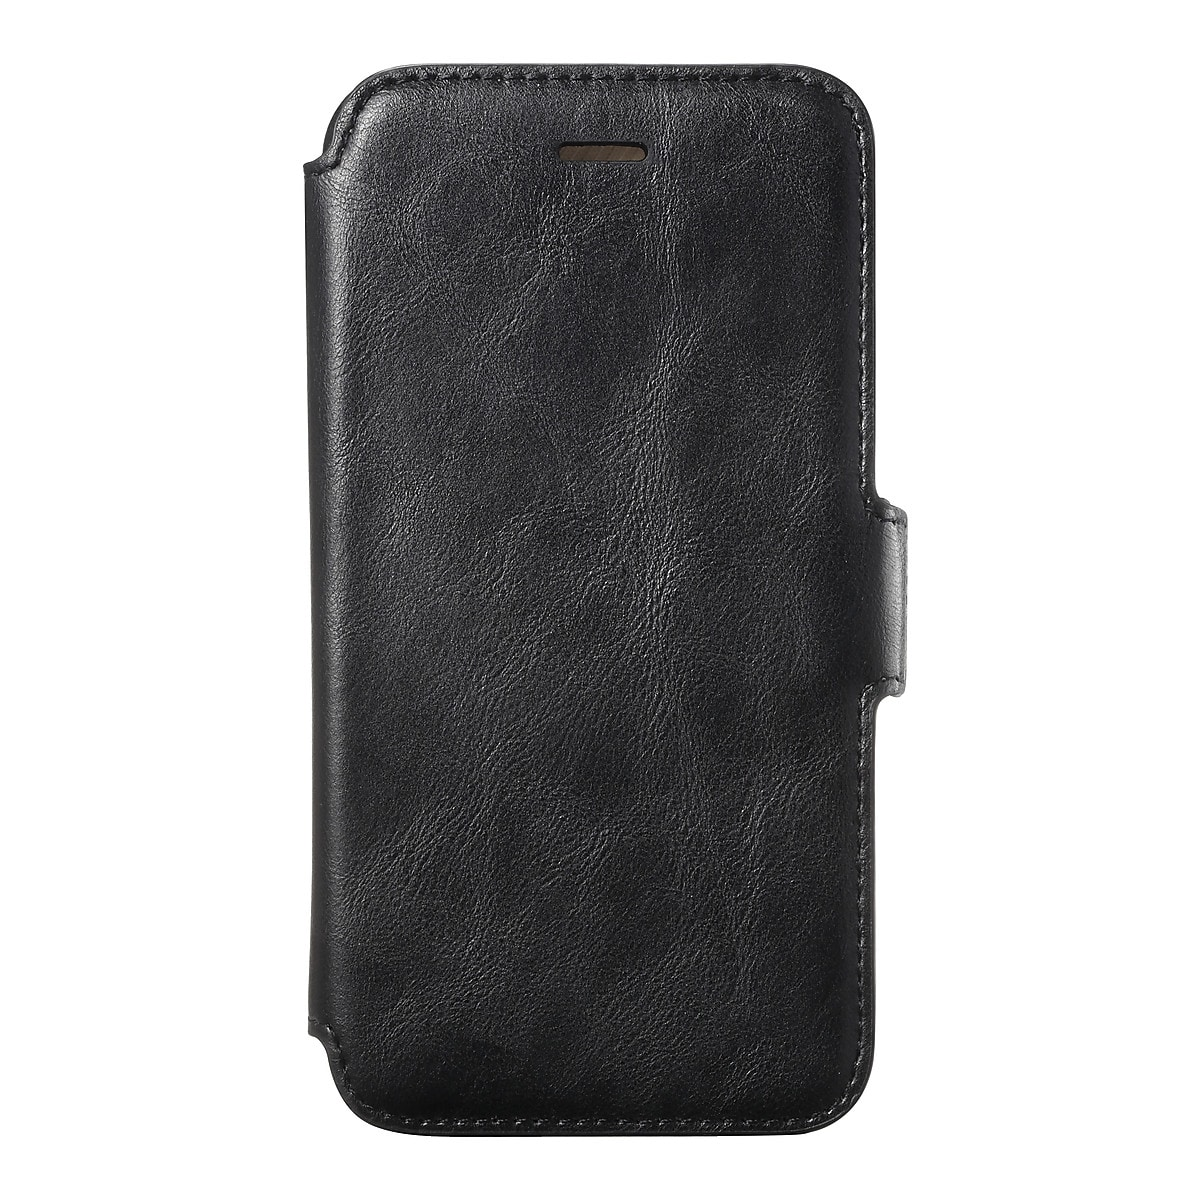 Plånboksfodral för iPhone X/XS Holdit Style